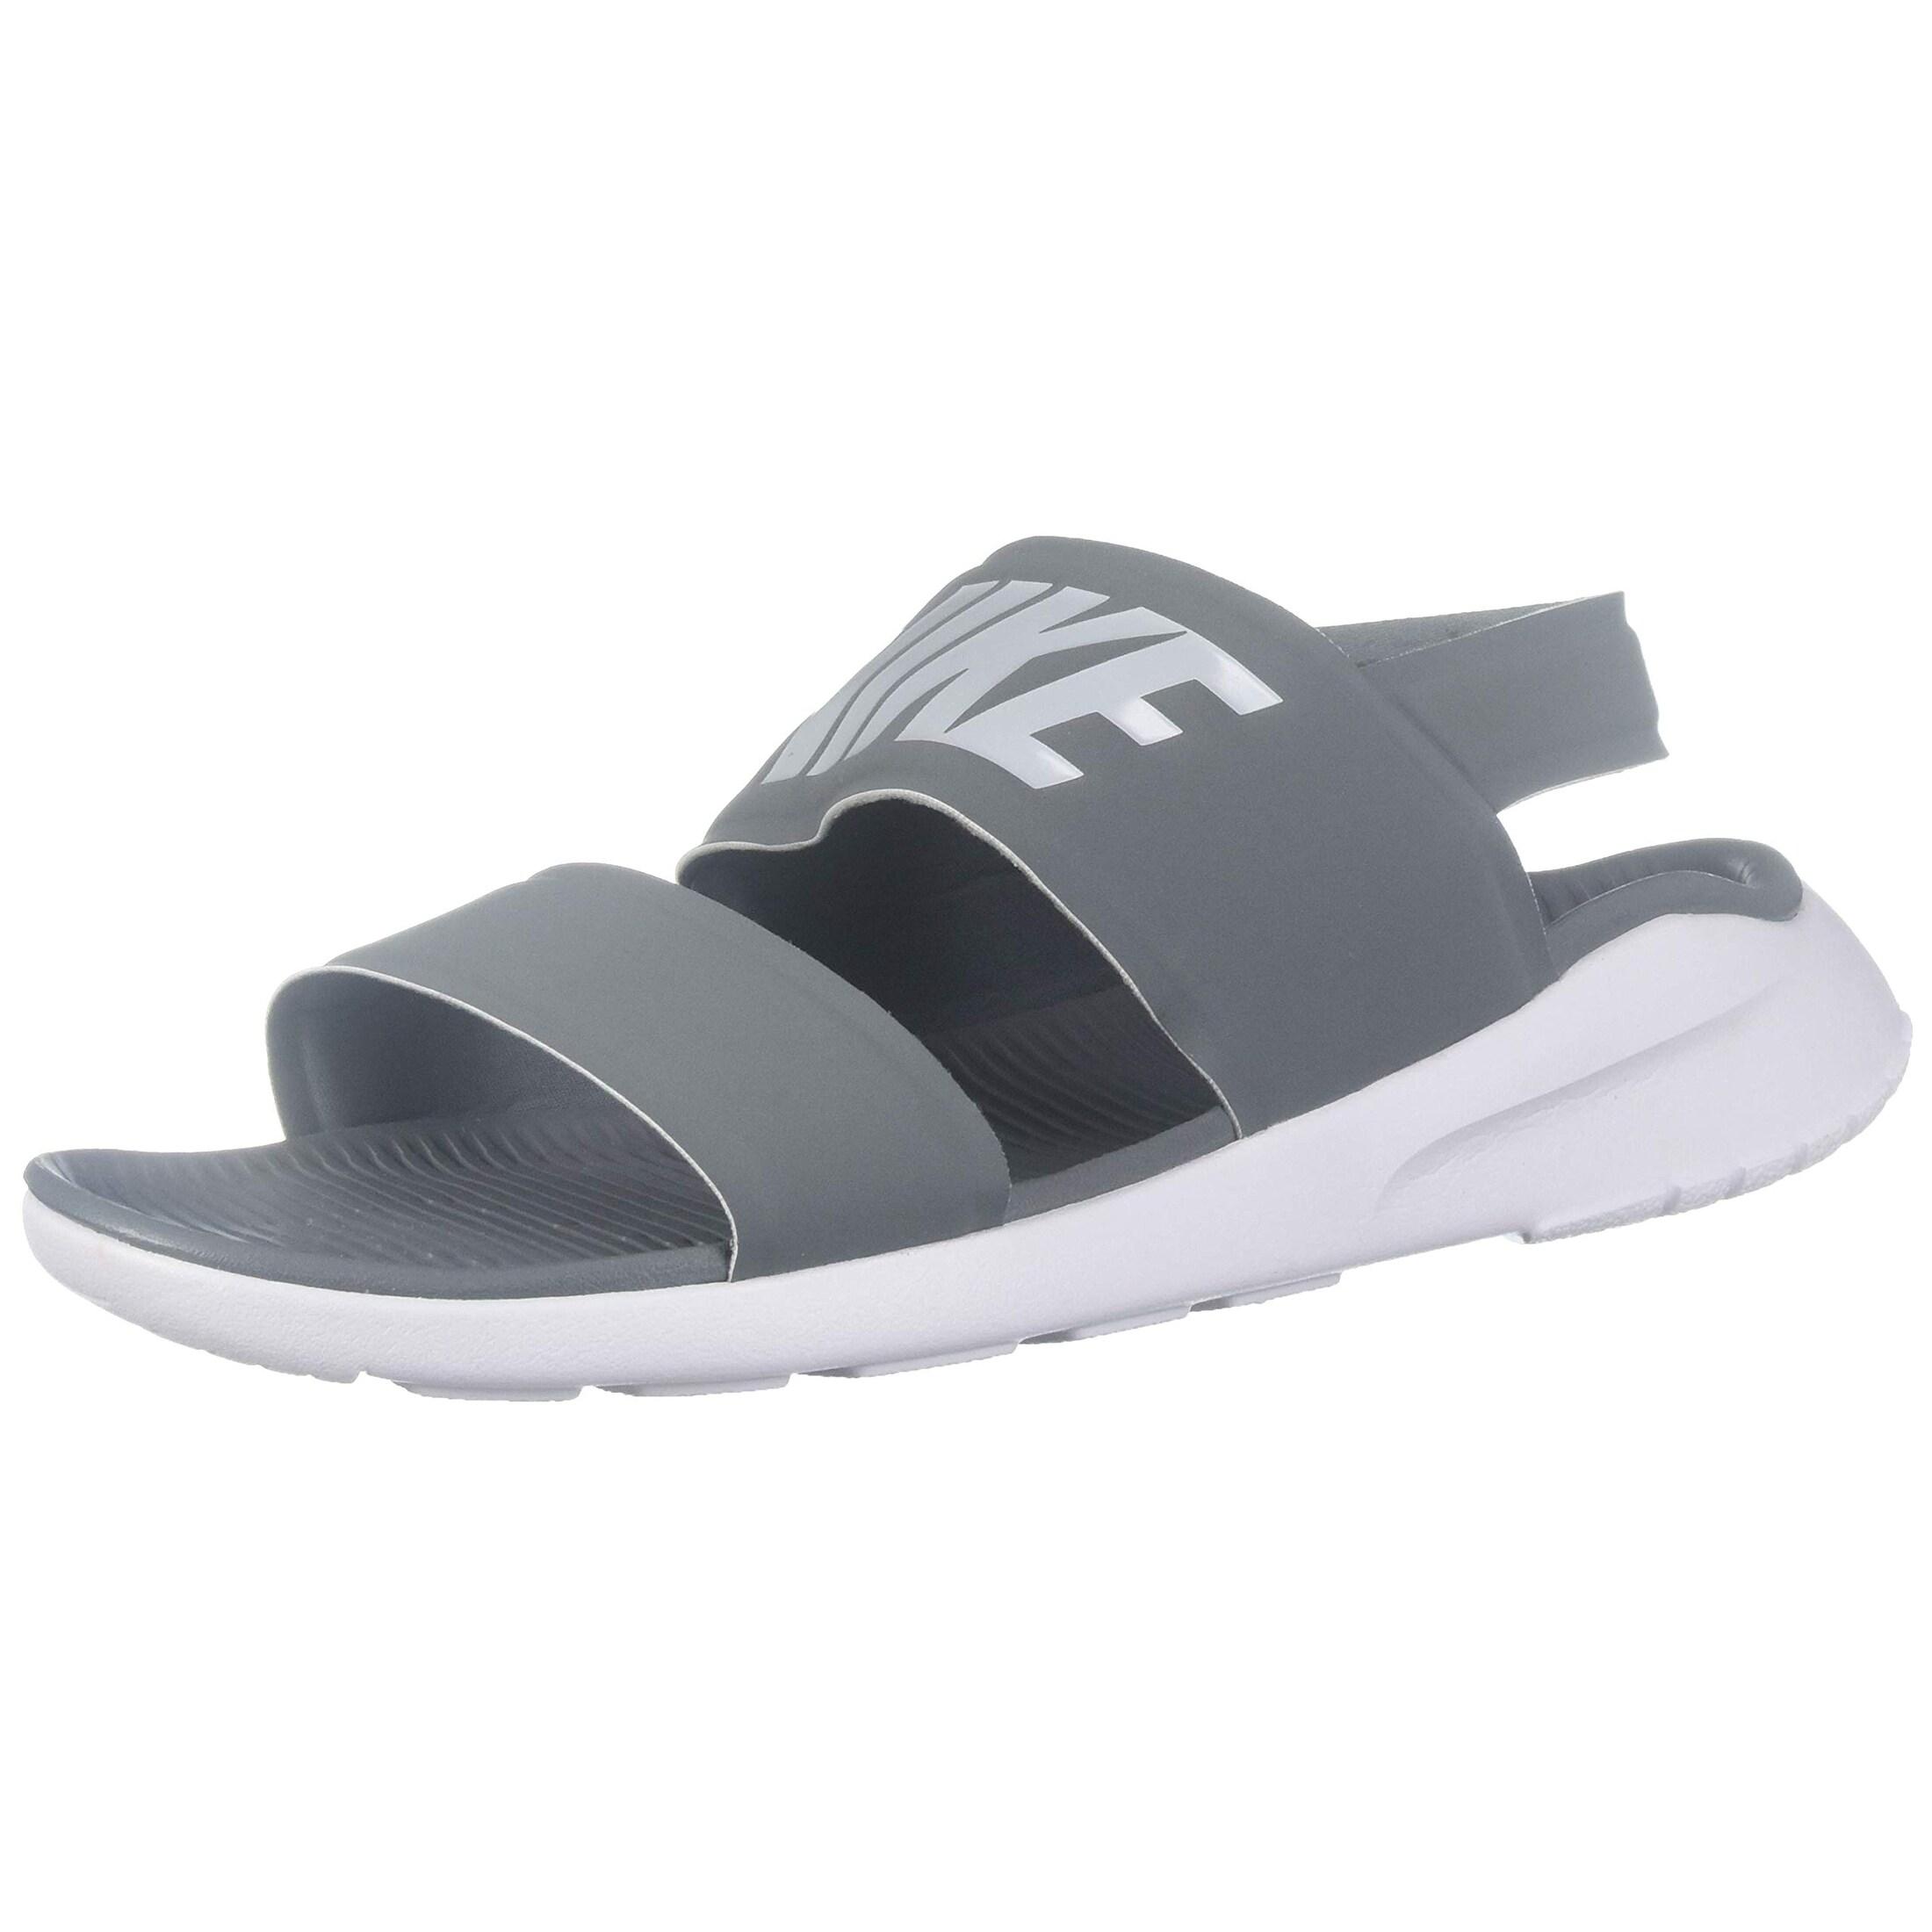 2e06de8b9cc7 Buy Nike Women s Sandals Online at Overstock